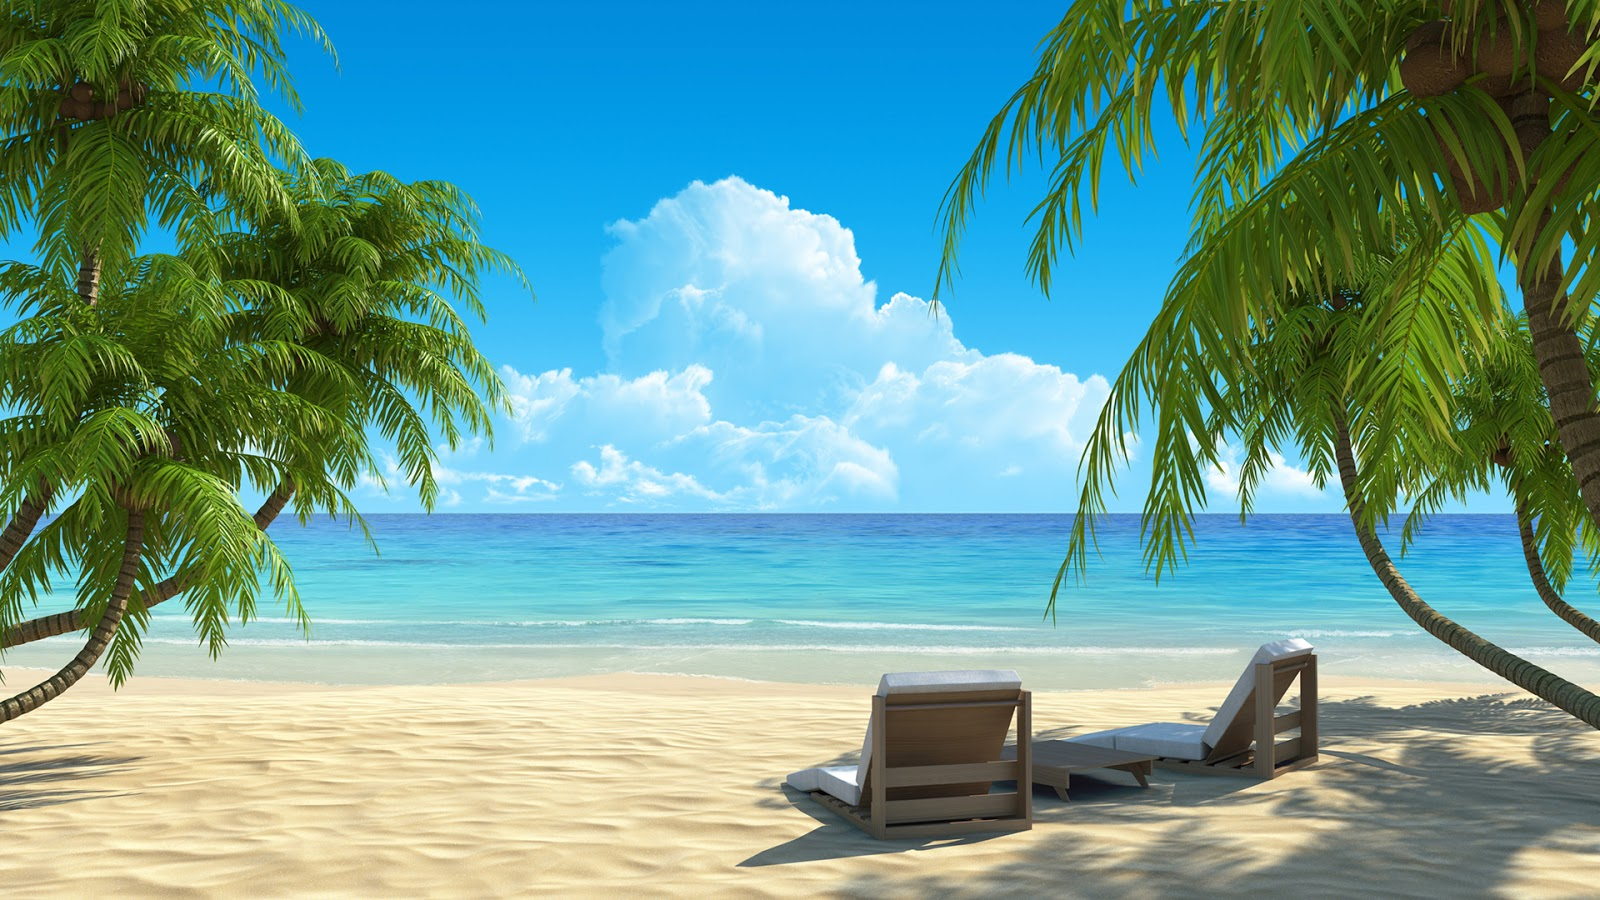 Beautiful Beach Wallpapers: Studio Backgrounds: Most Beautiful Beaches